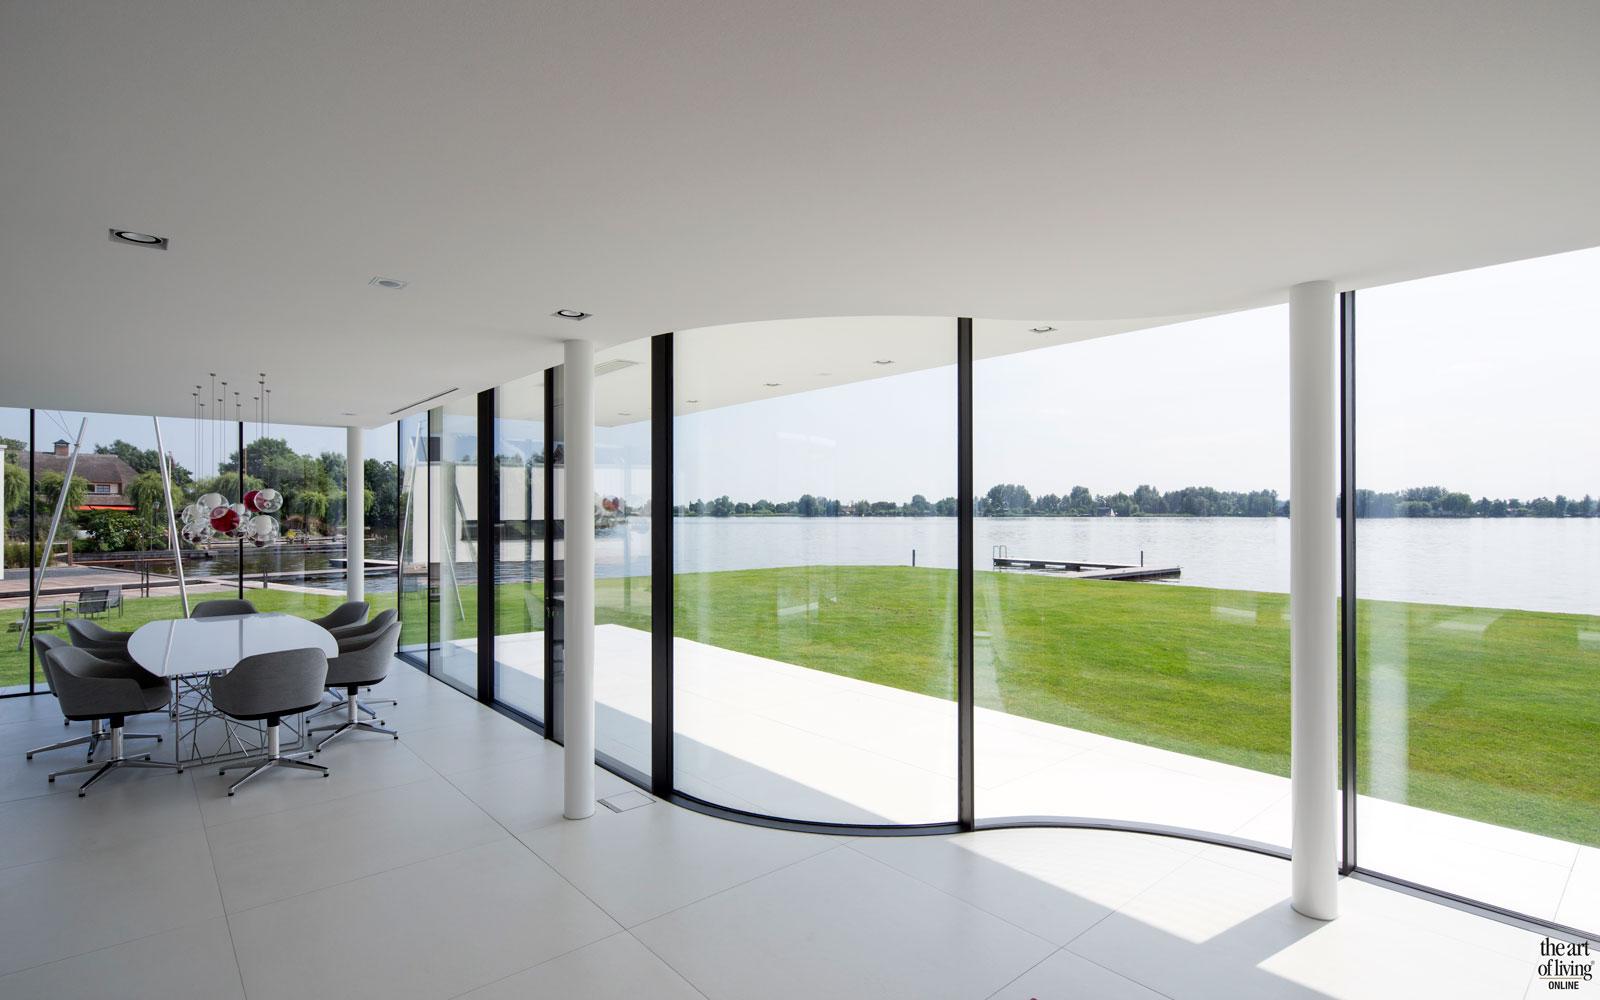 Ronde glaspuien, Skyframe, uitzicht, ramen, villa aan het water, Lab32 architecten